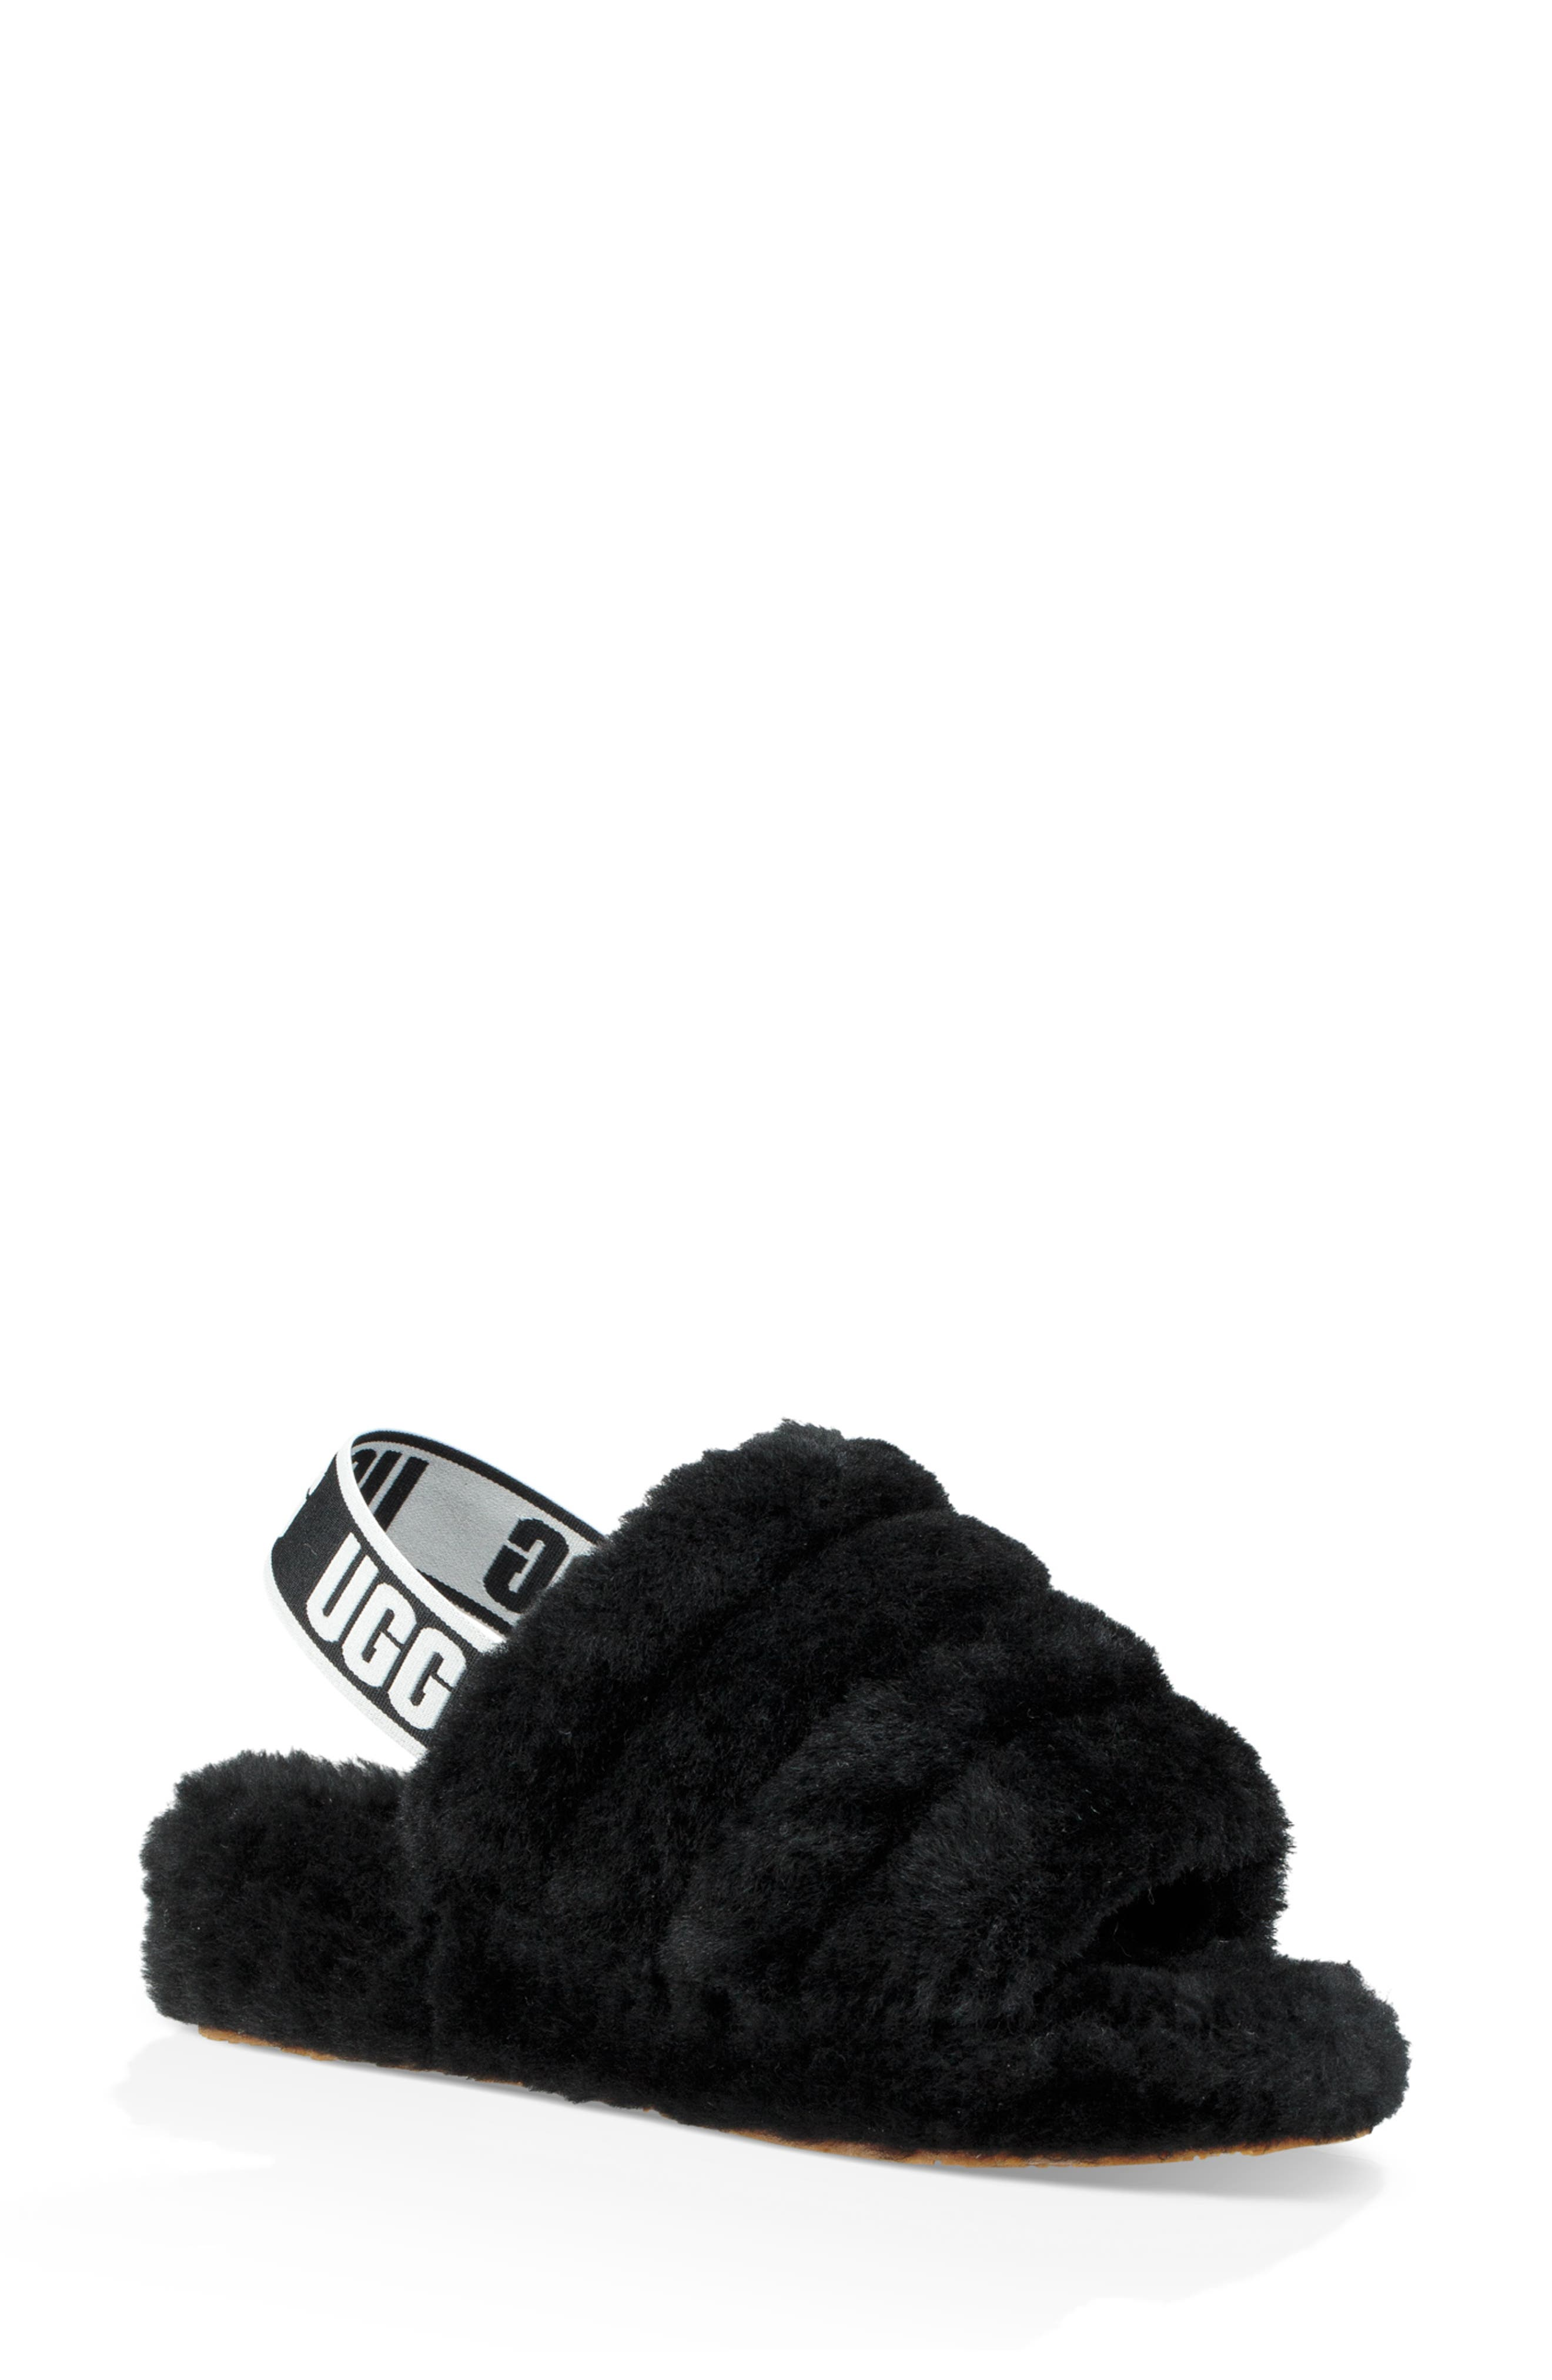 Ugg Fluff Yeah Genuine Shearling Slipper, Black